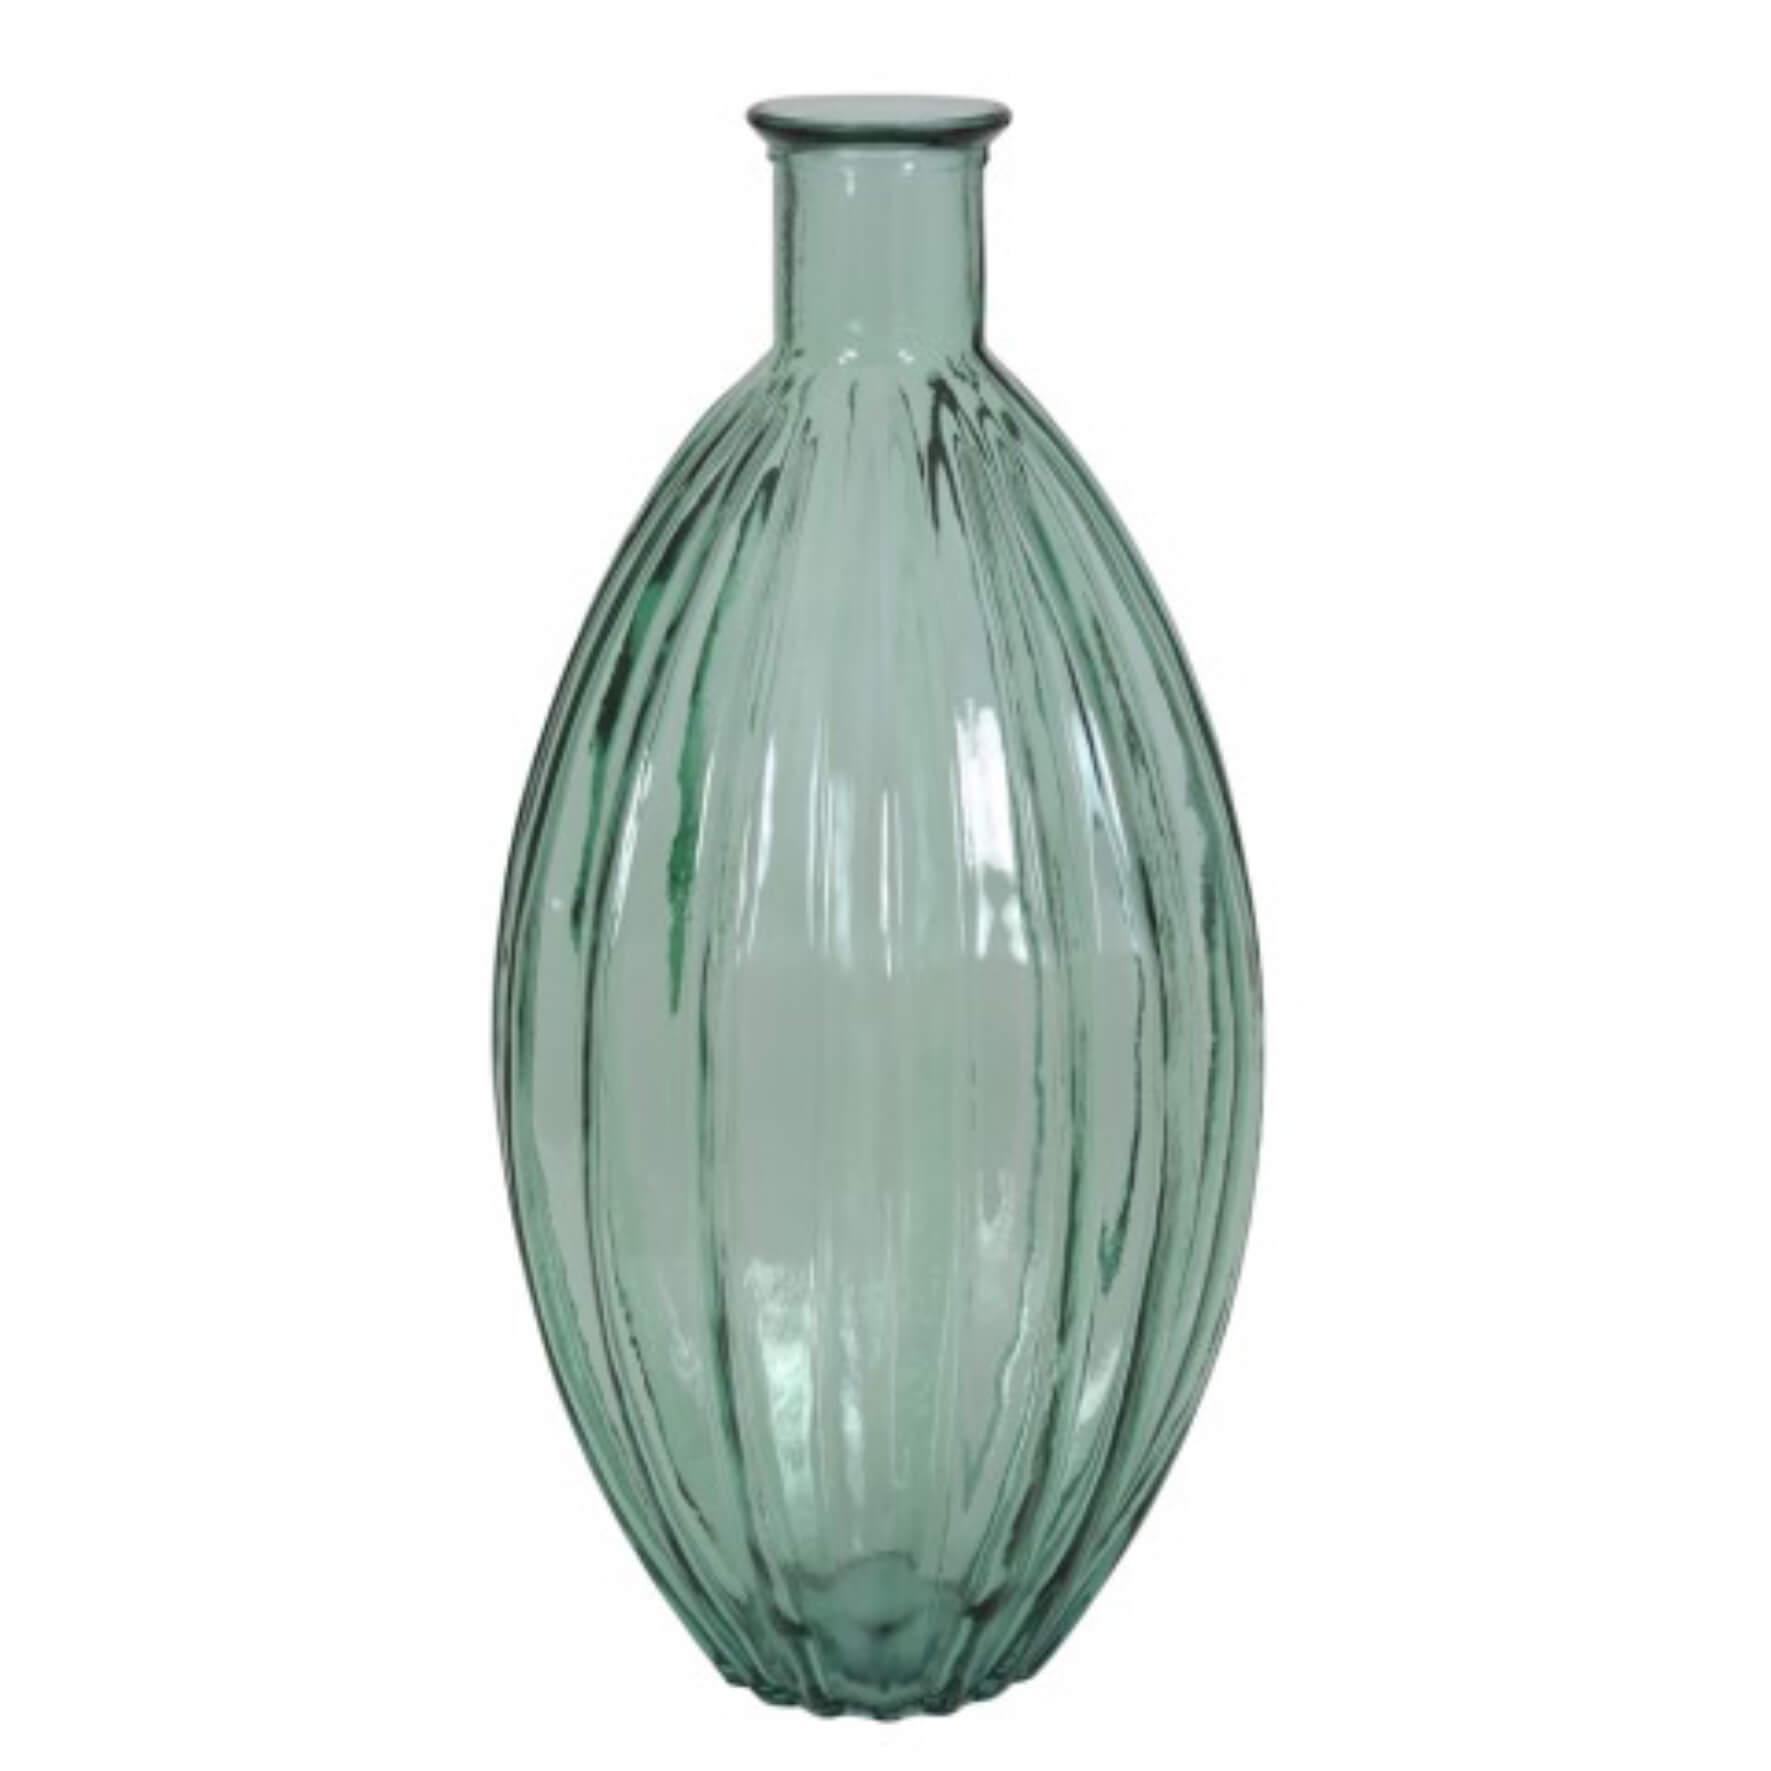 Lampe vase en verre Palloci vert d'eau tall